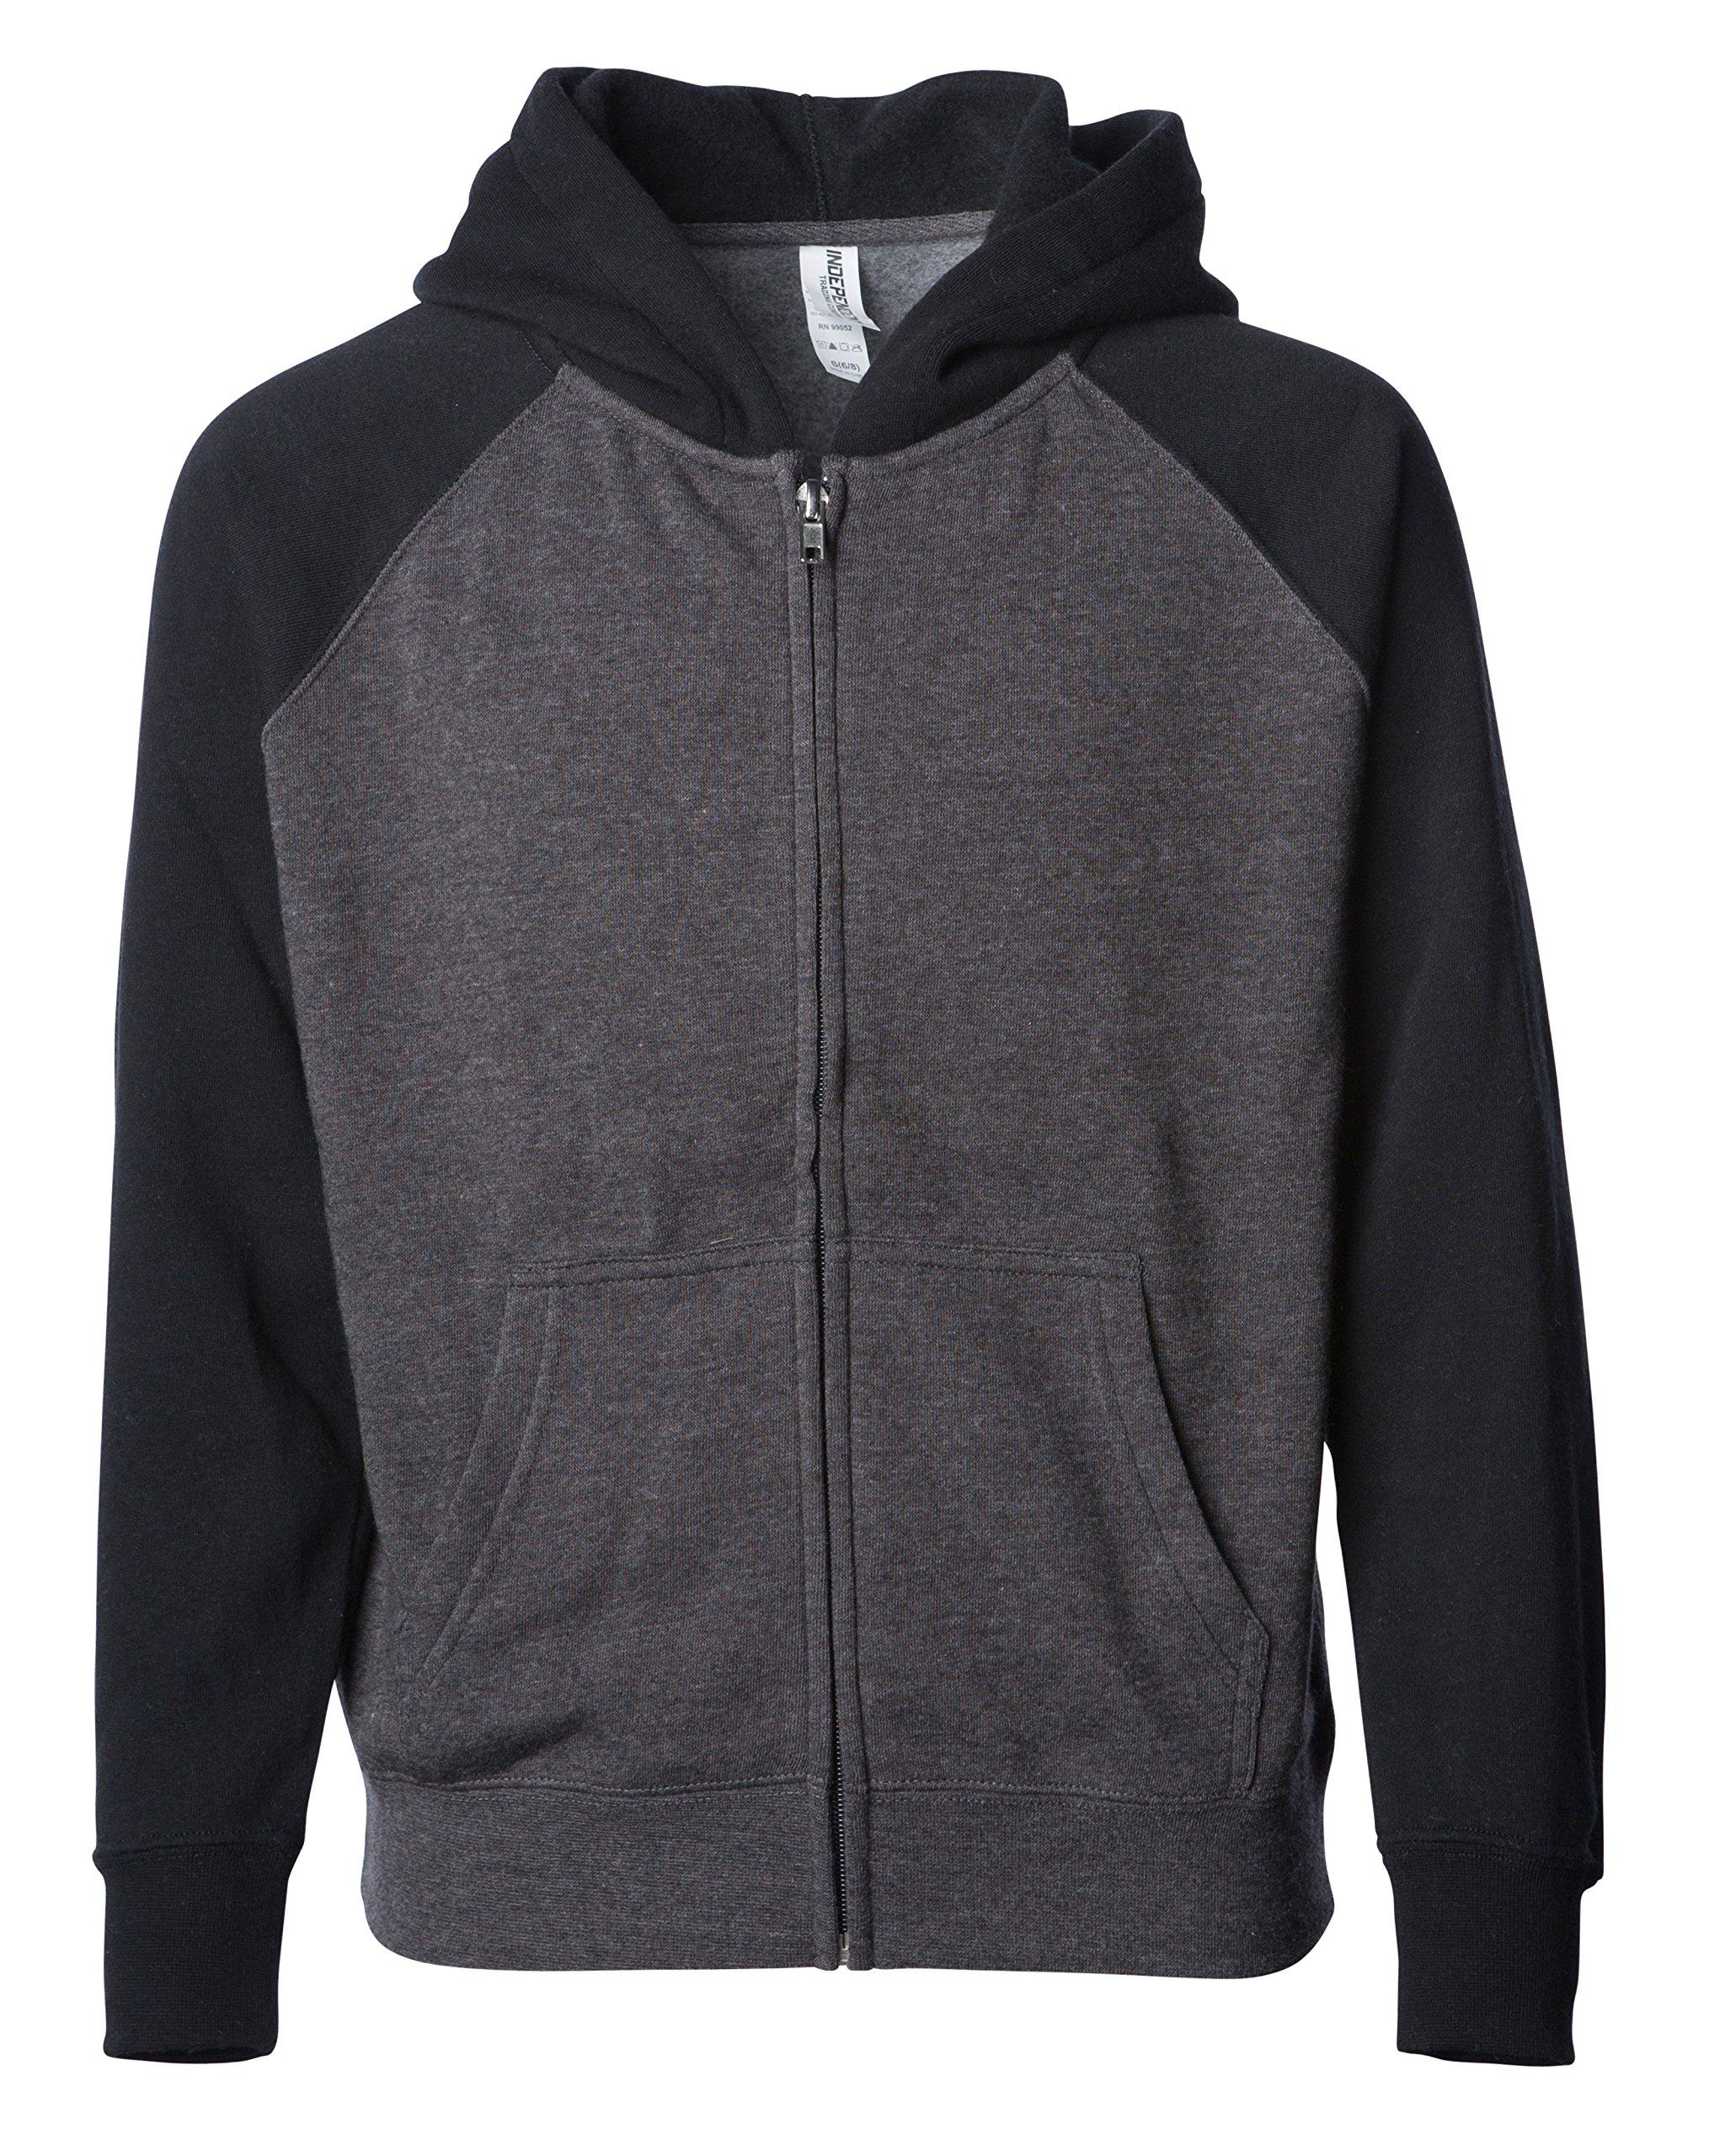 Childrens Lightweight Raglan Sleeve Zip Up Hoodie for Boys and Girls C/B Large Charcoal/Black